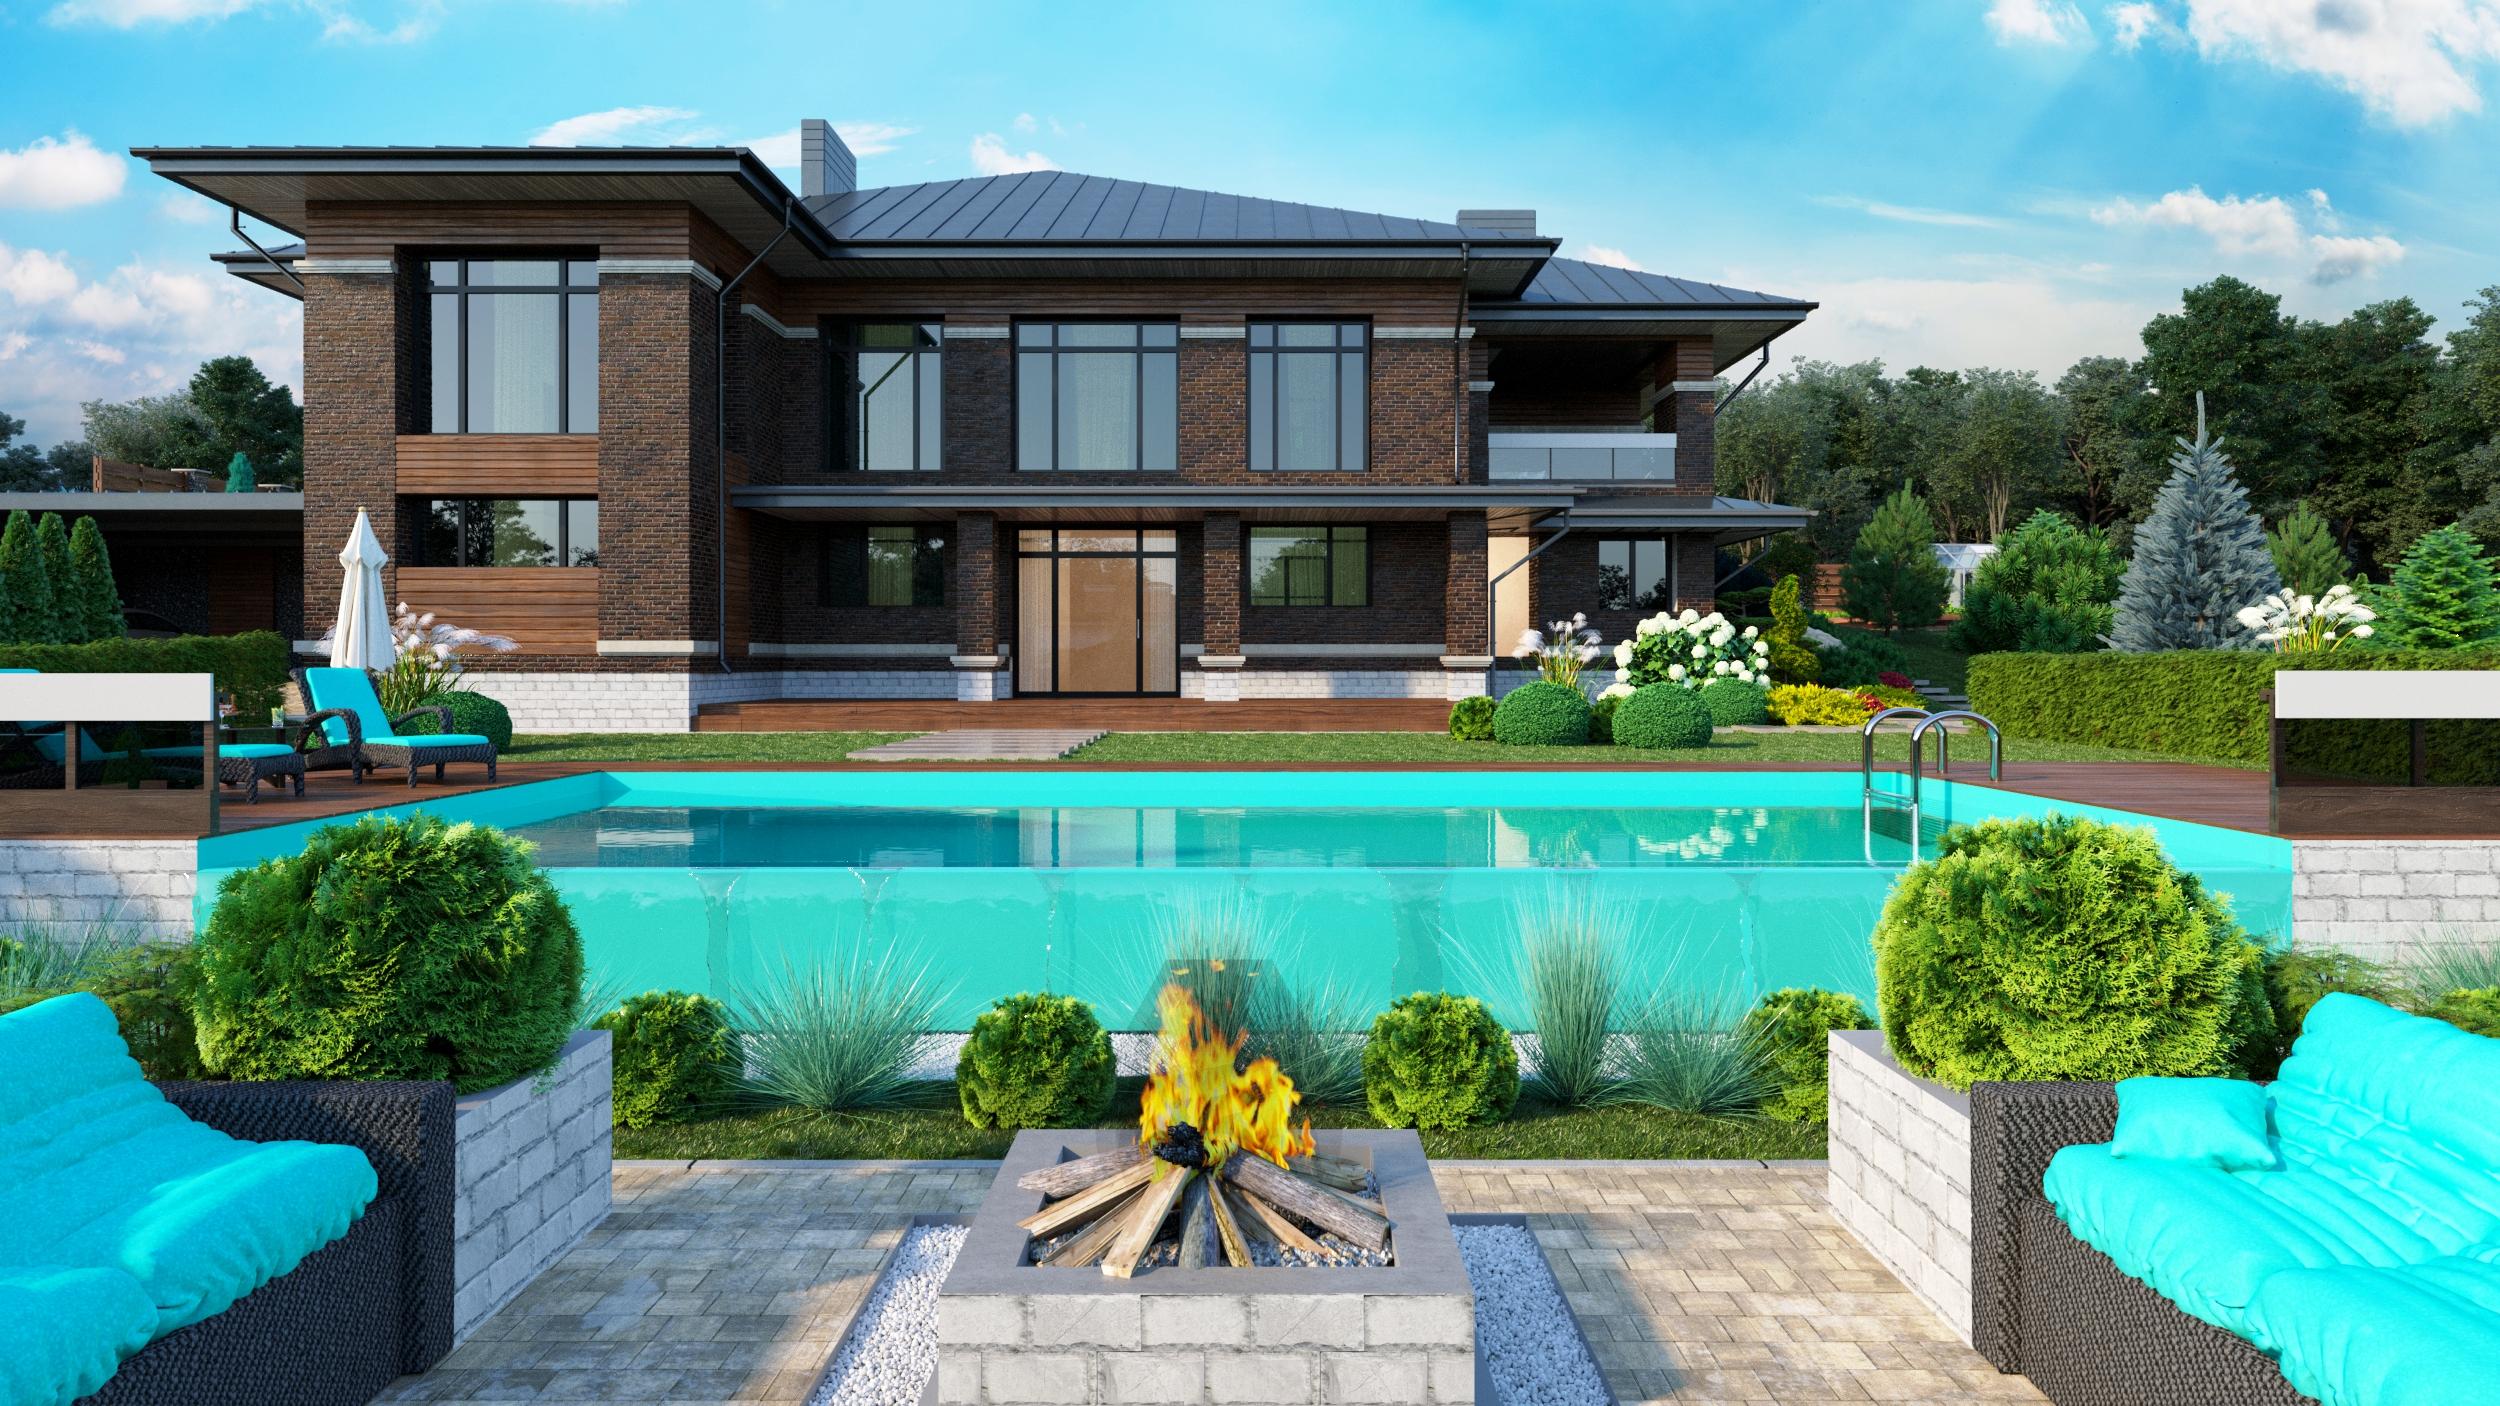 Фриланс ландшафтного дизайна цены на 3д фриланс